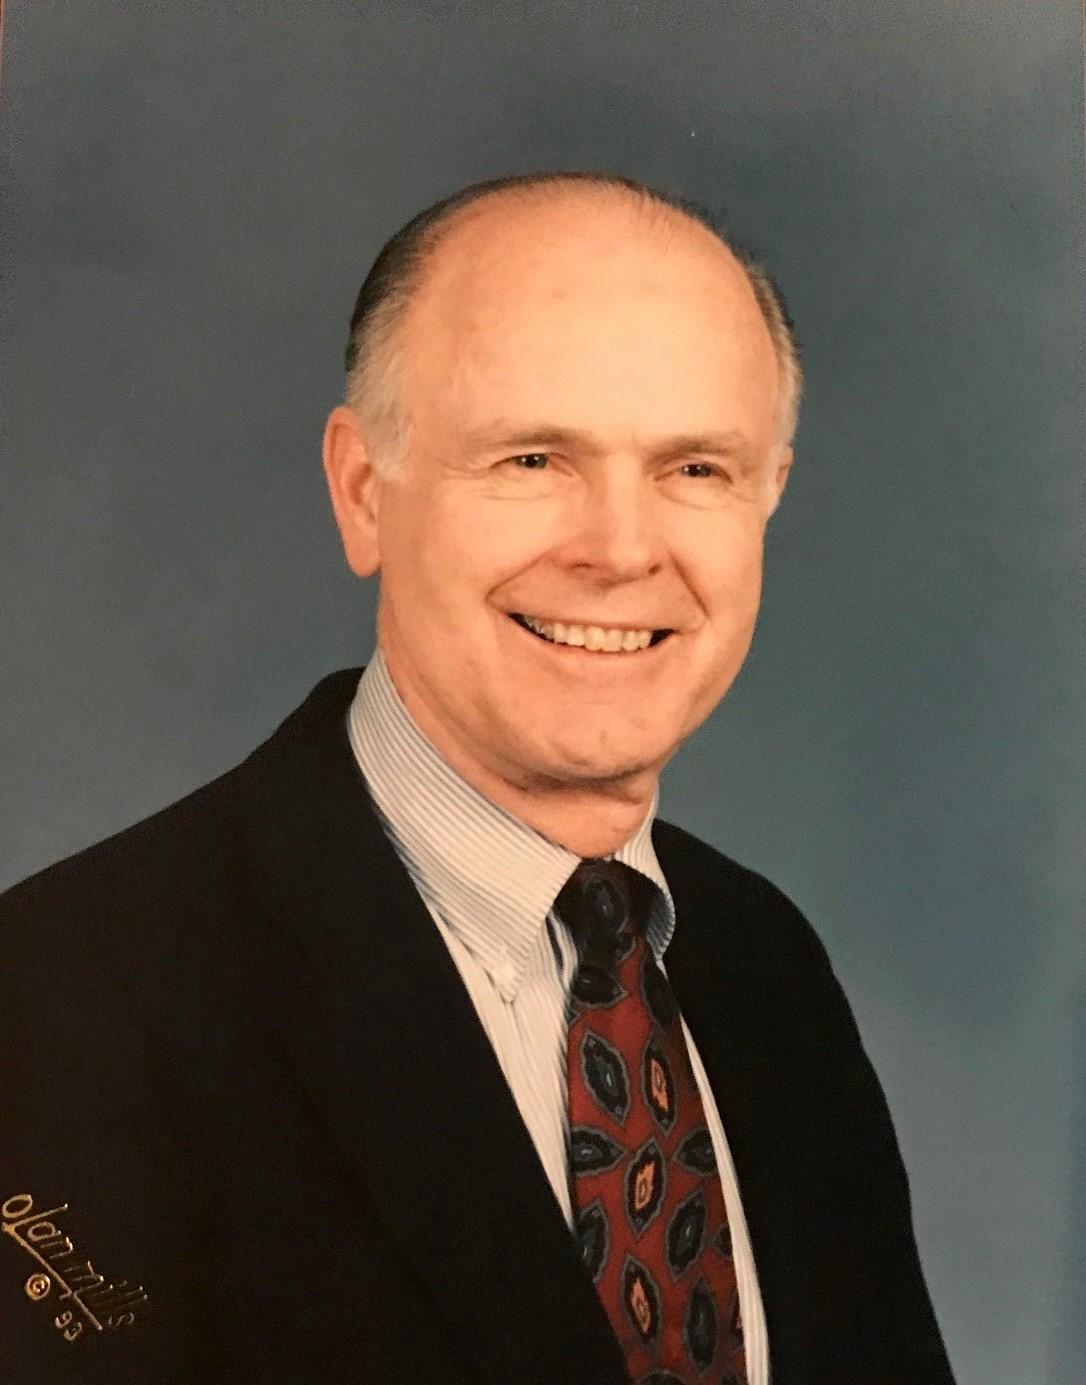 Philip Ebert